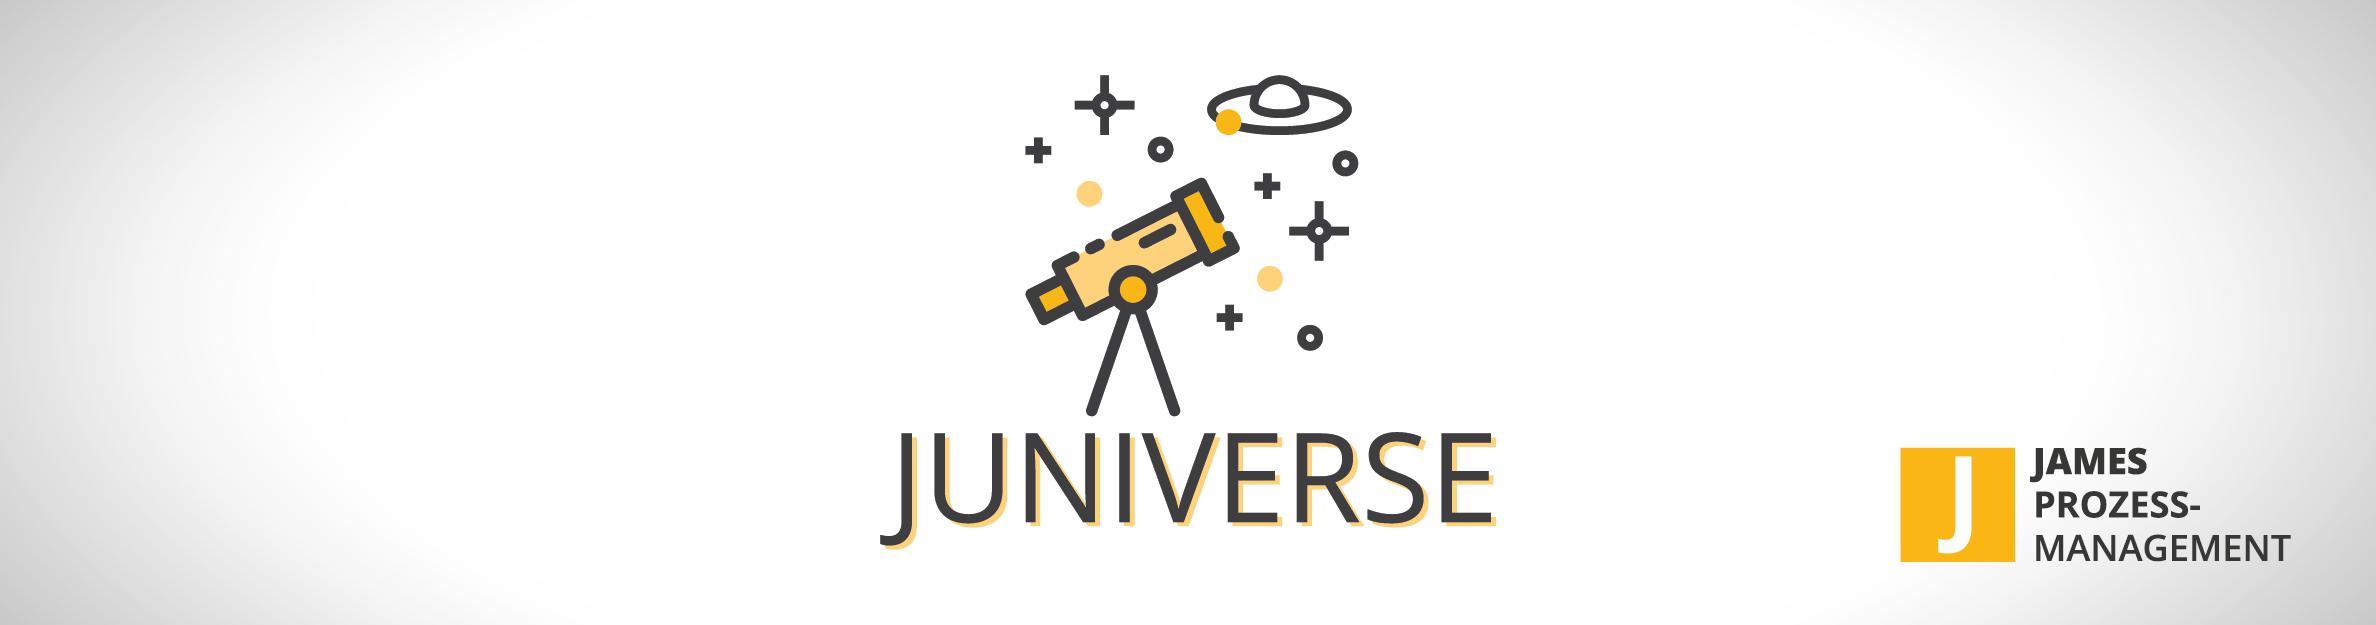 jUniverse_Banner